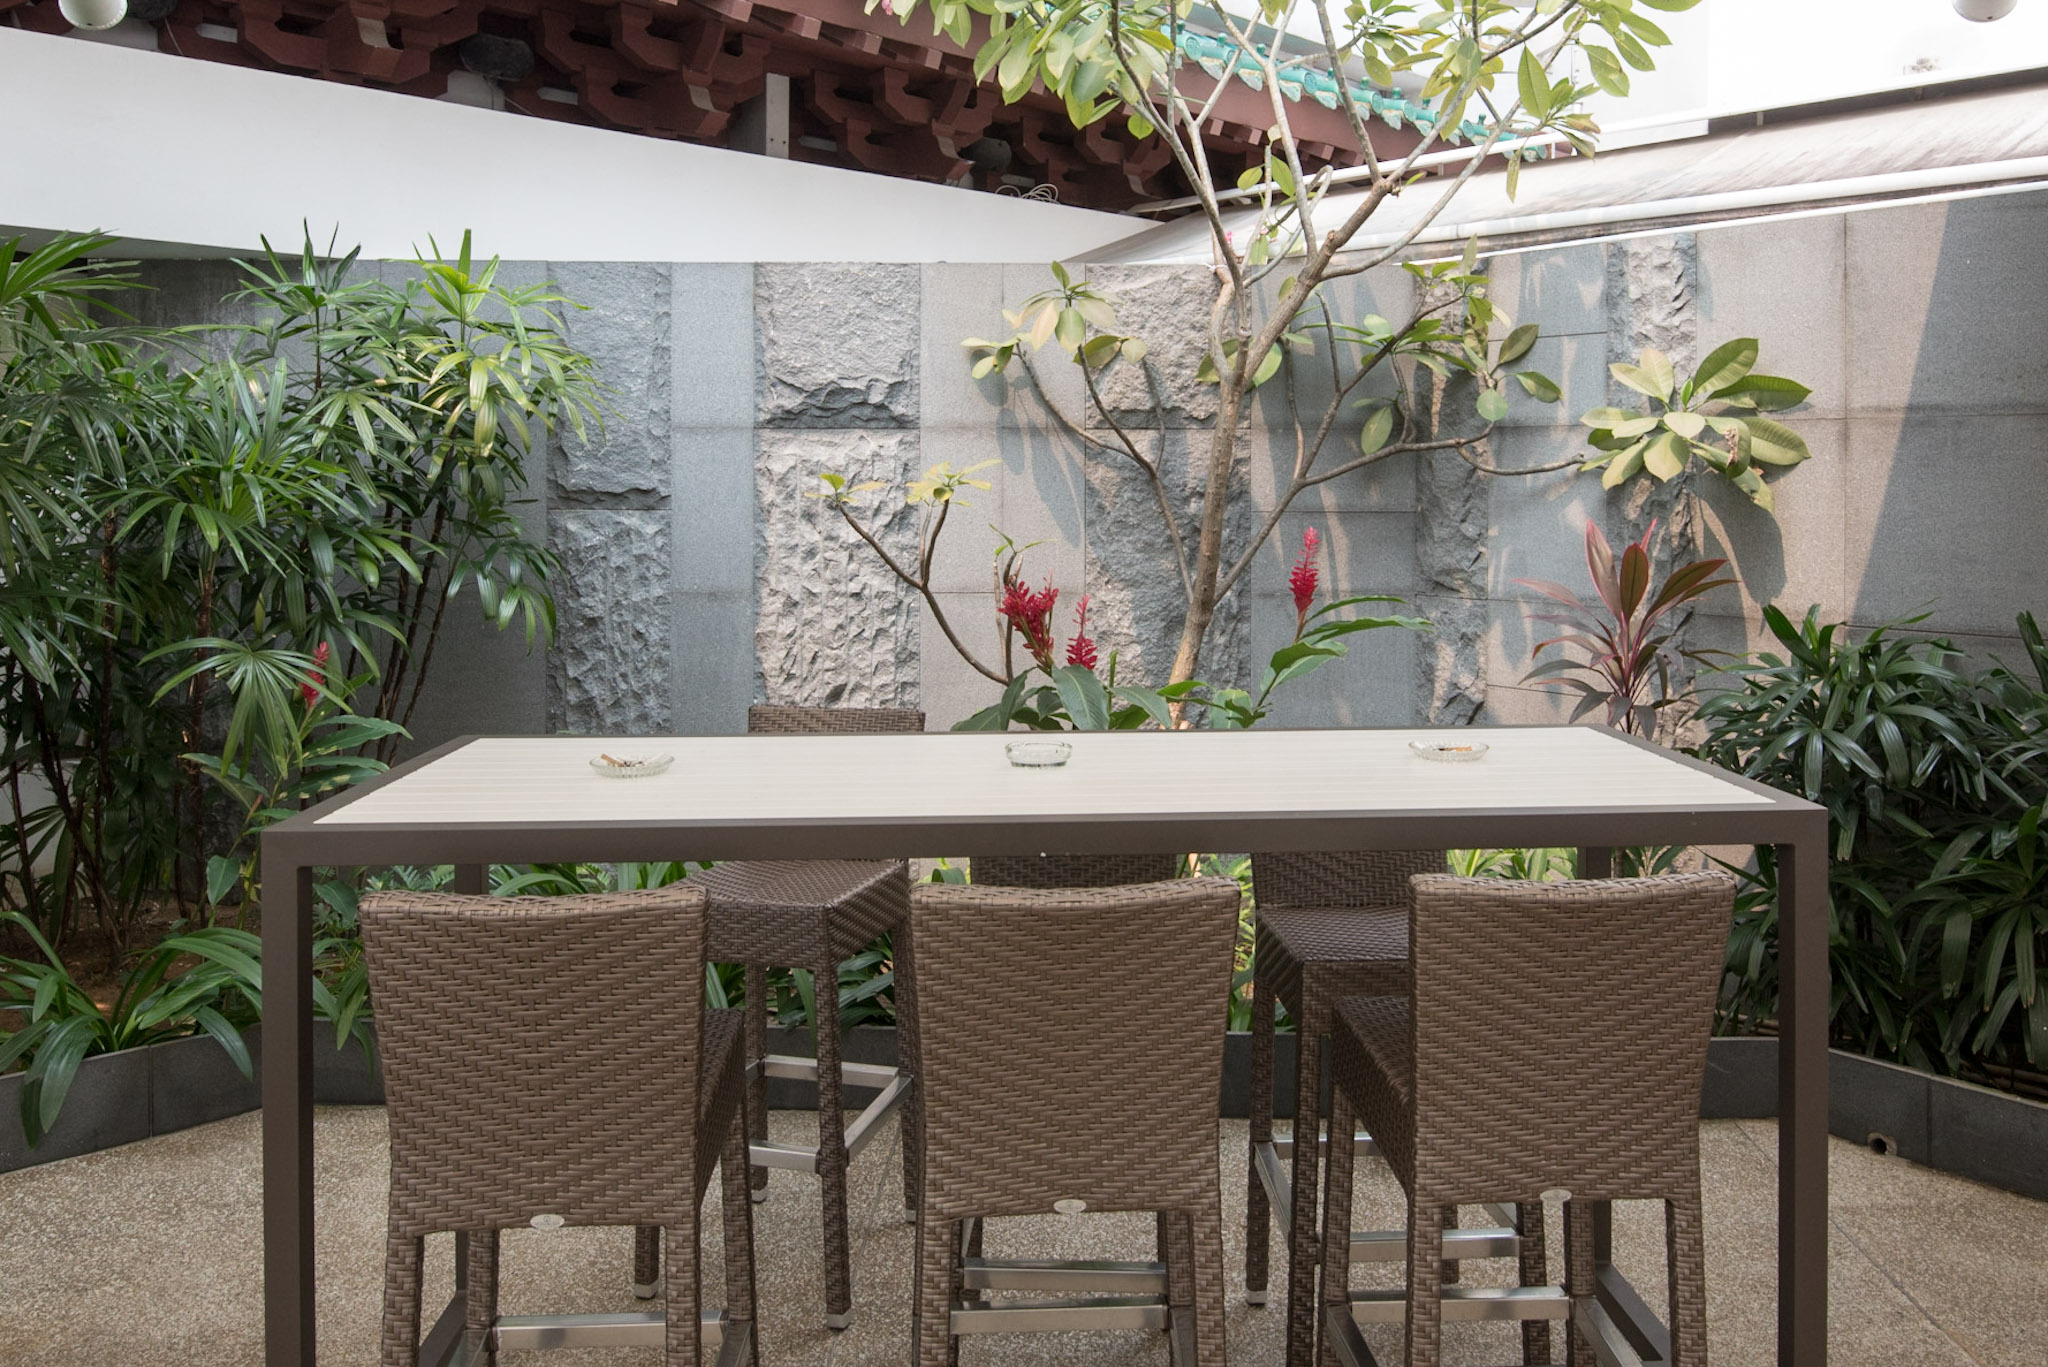 Al Fresco Seating Pool Grill - Singapore Marriott Tang Plaza Hotel